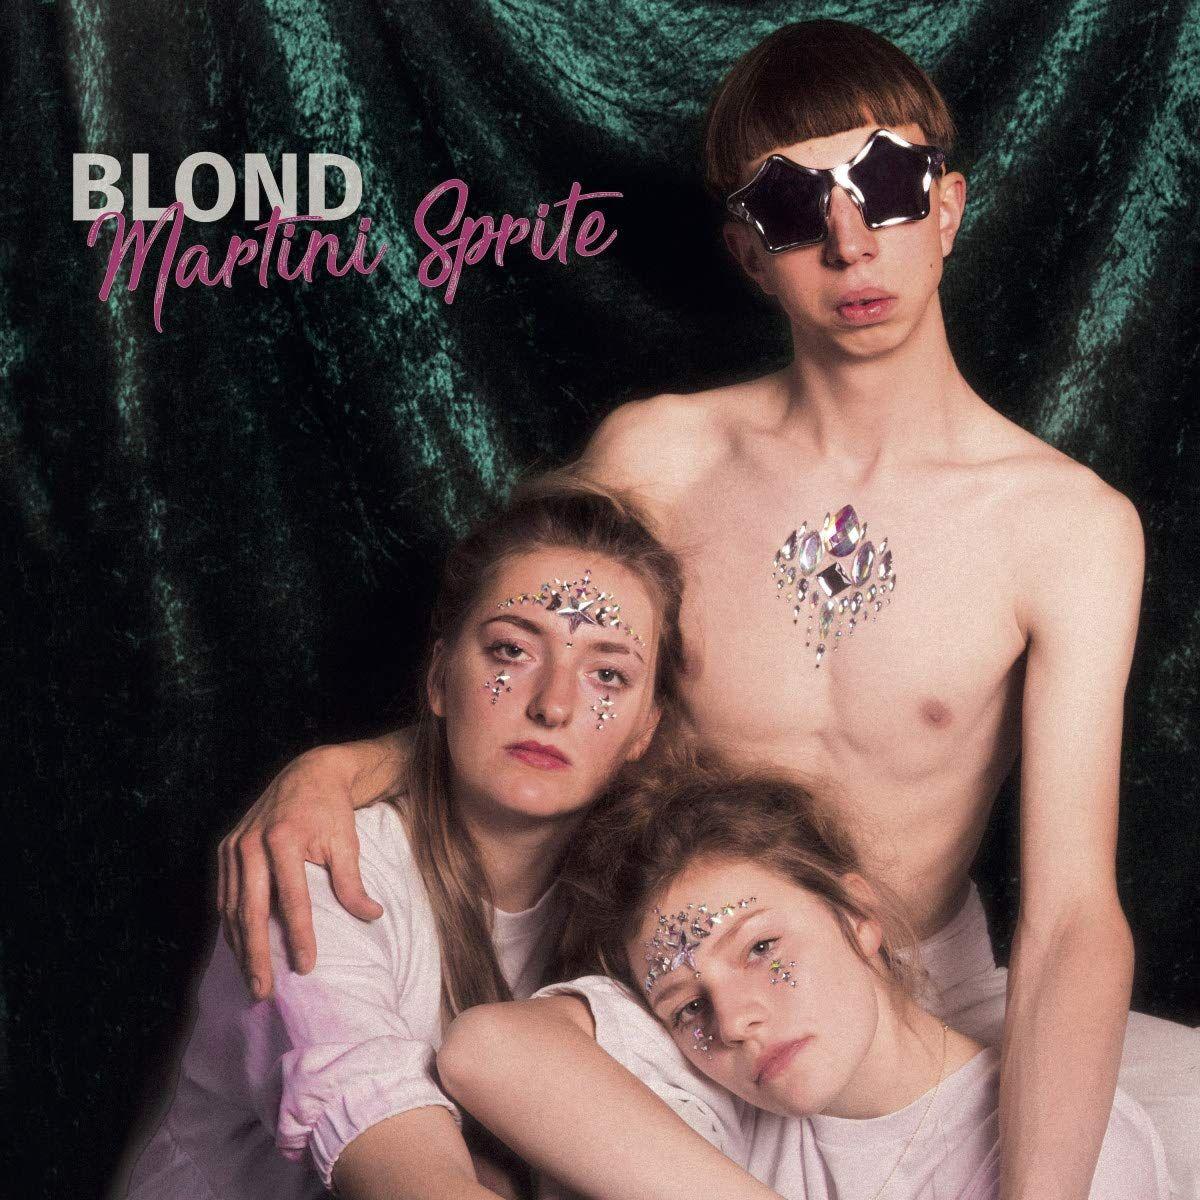 Abgehört/ Blond: Martini Sprite COVER